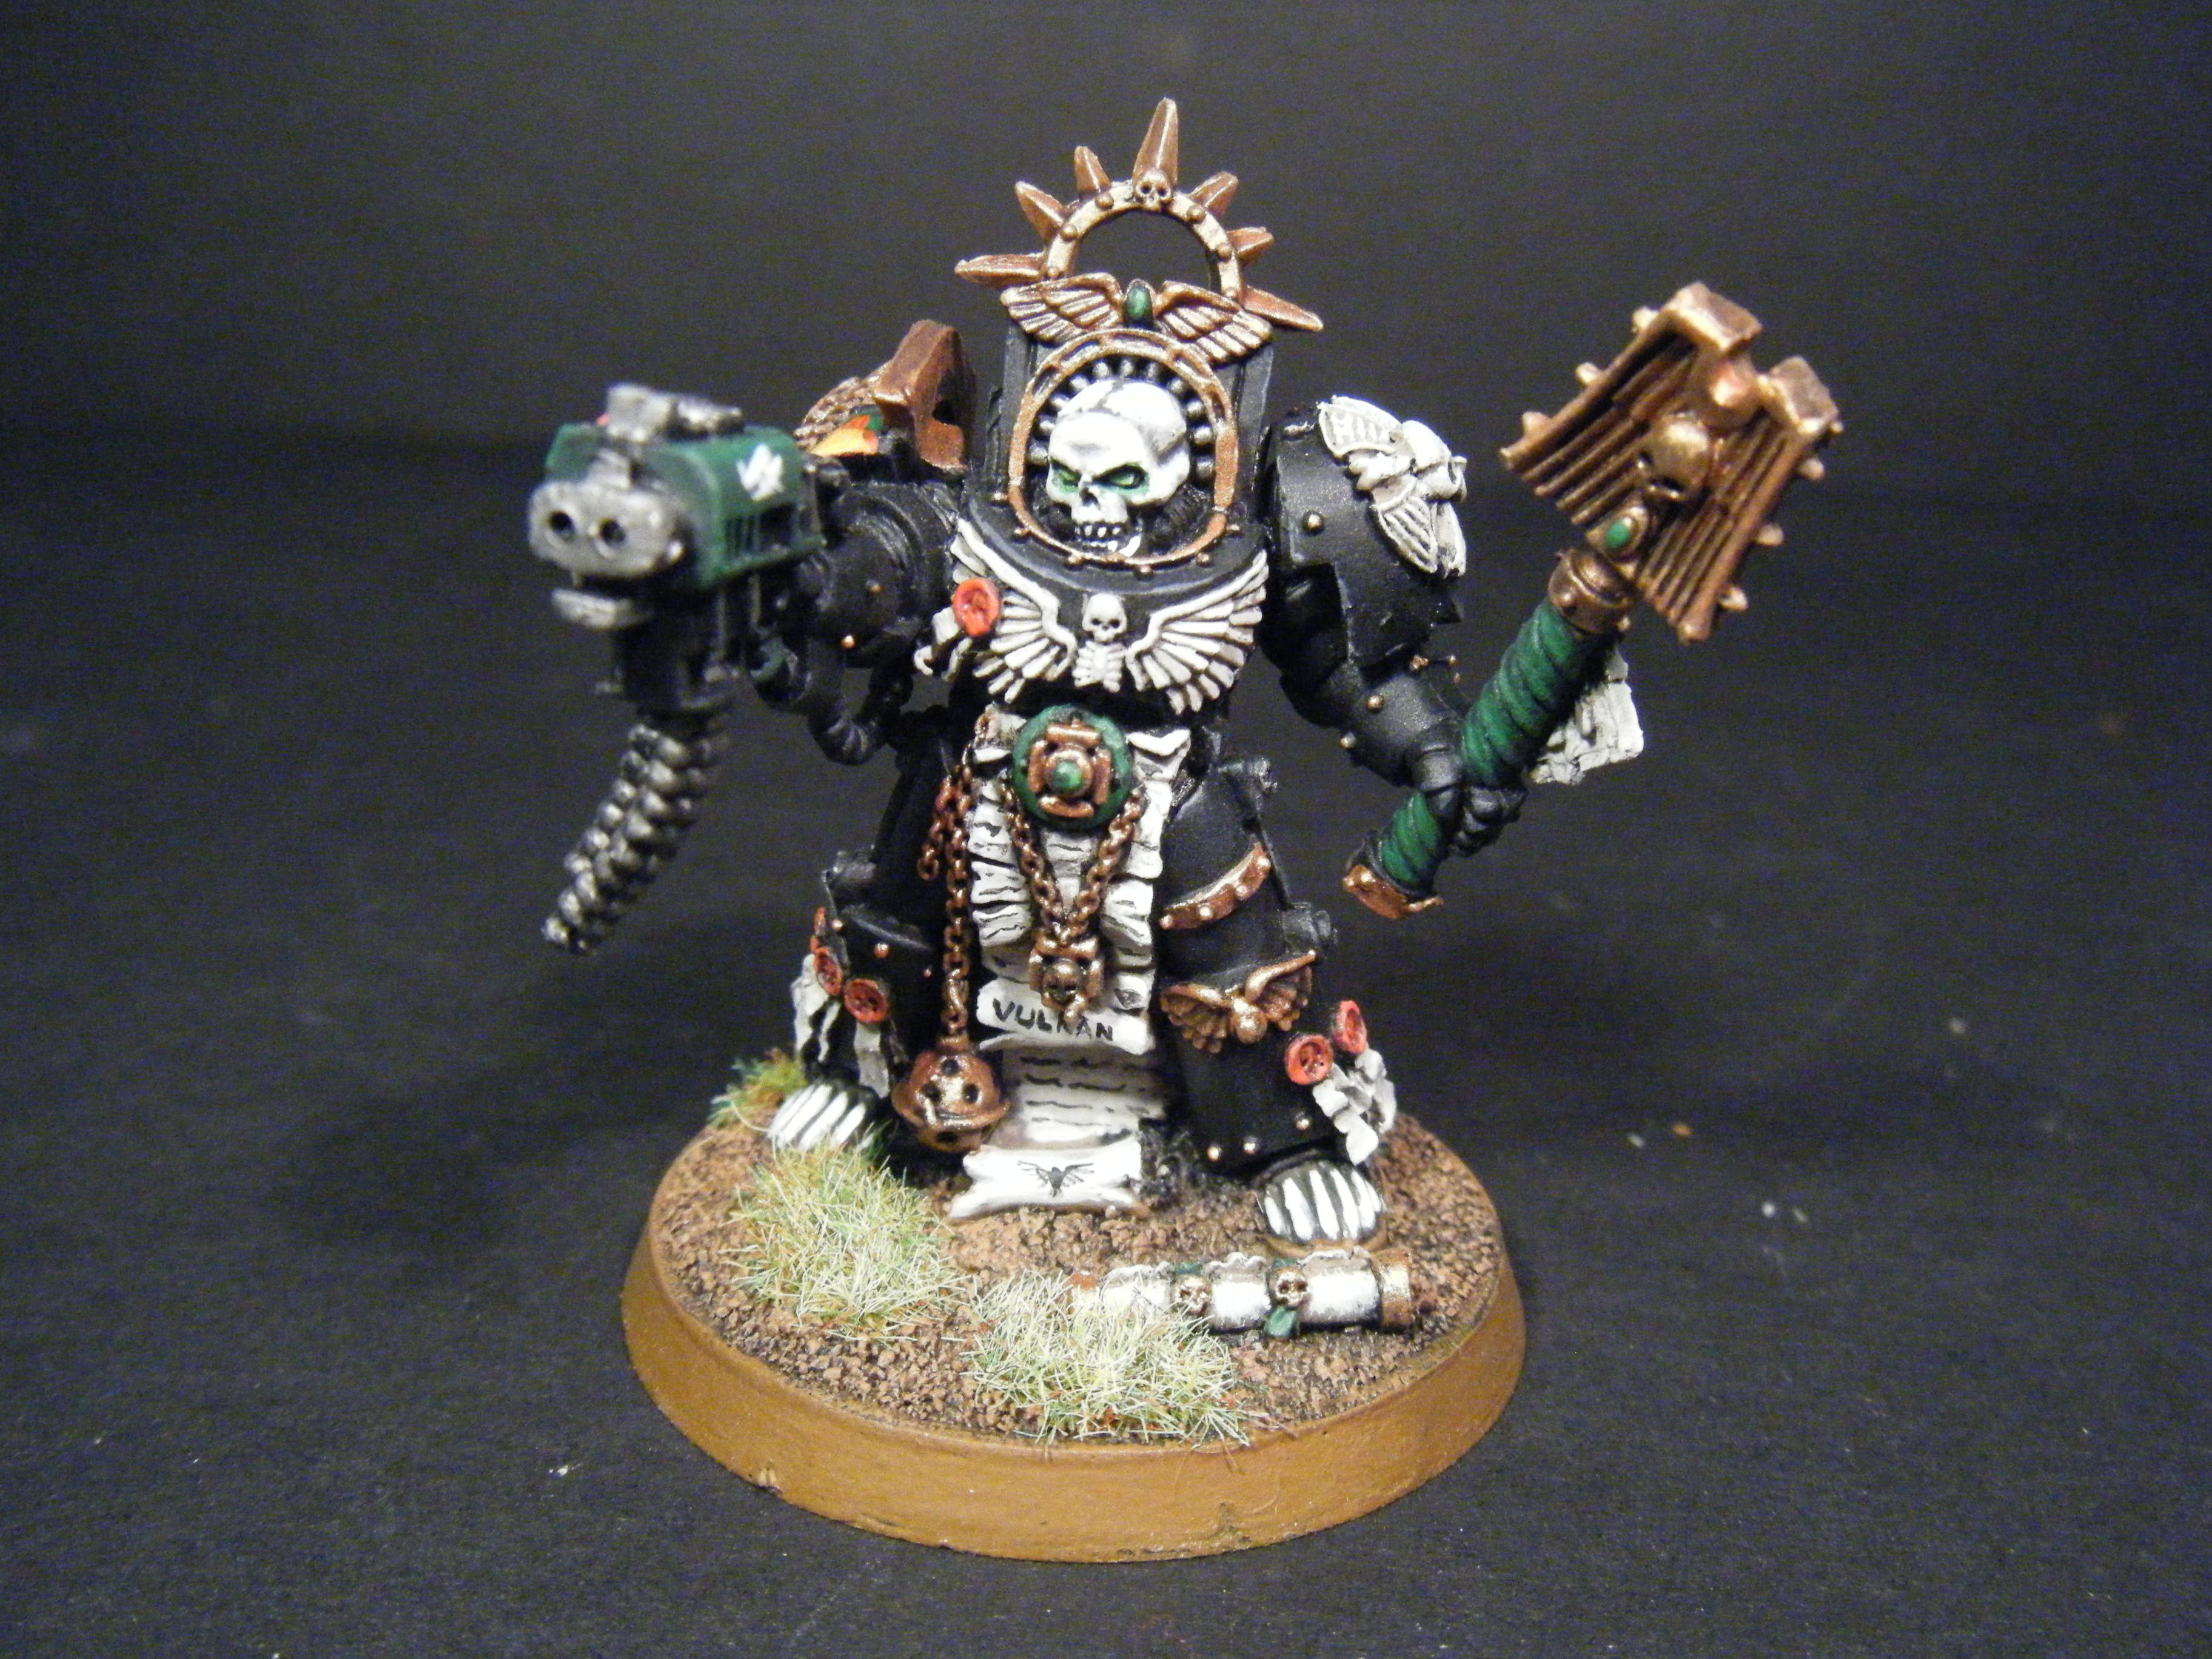 Chaplain, Salamanders, Space Marines, Terminator Chaplain, Warhammer 40,000